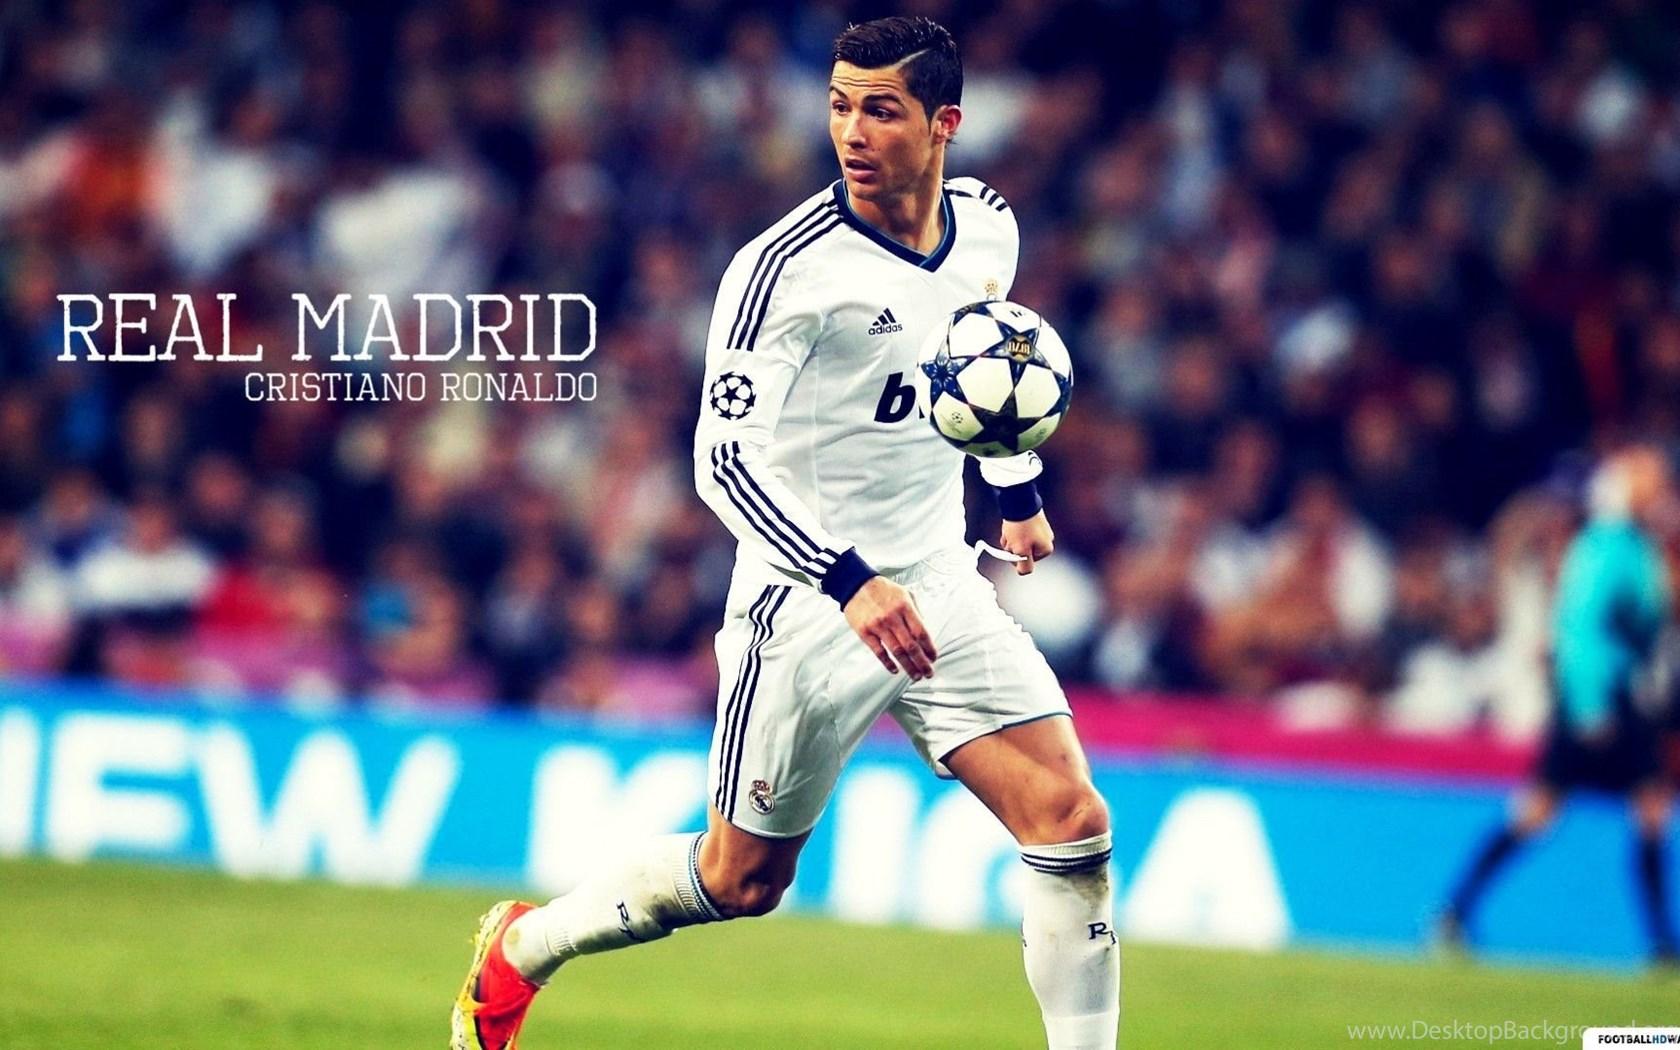 Sports Legend Cristiano Ronaldo Real Madrid Hd Football Wallpapers Jpg Desktop Background